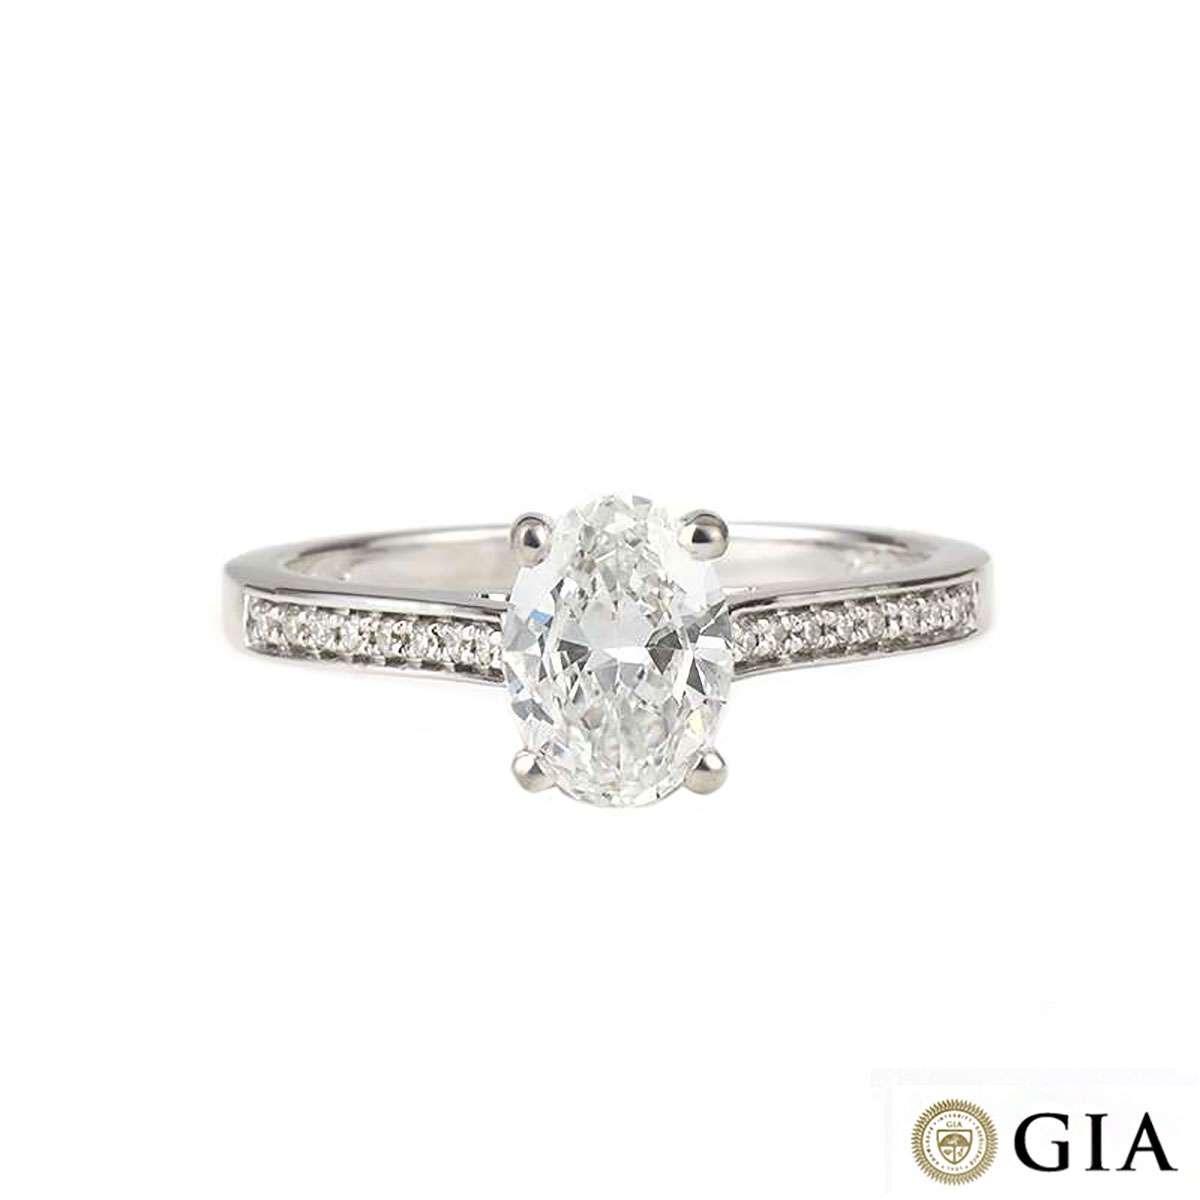 White Gold Oval Diamond Ring 1.03ct G/VS2